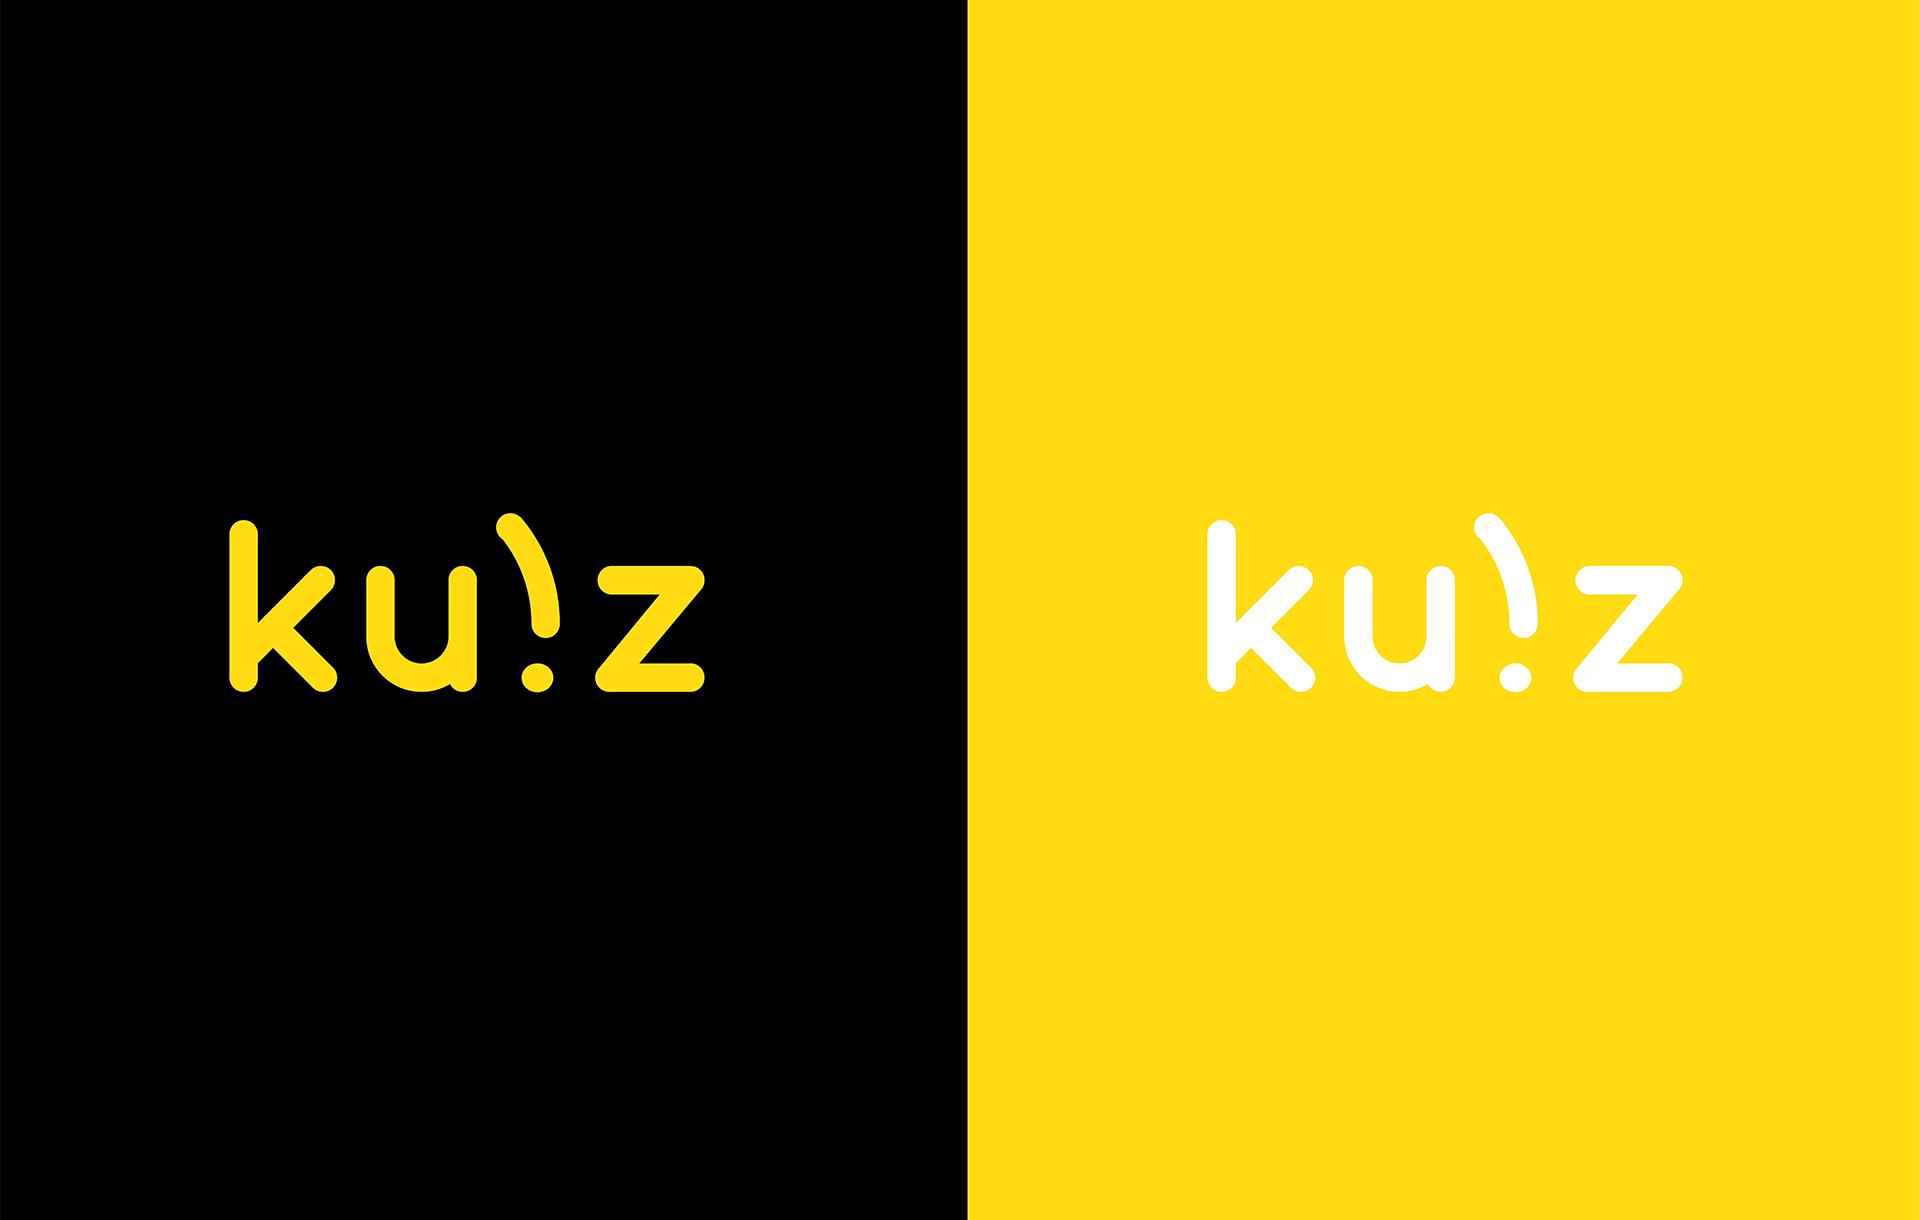 Kuiz - Villae